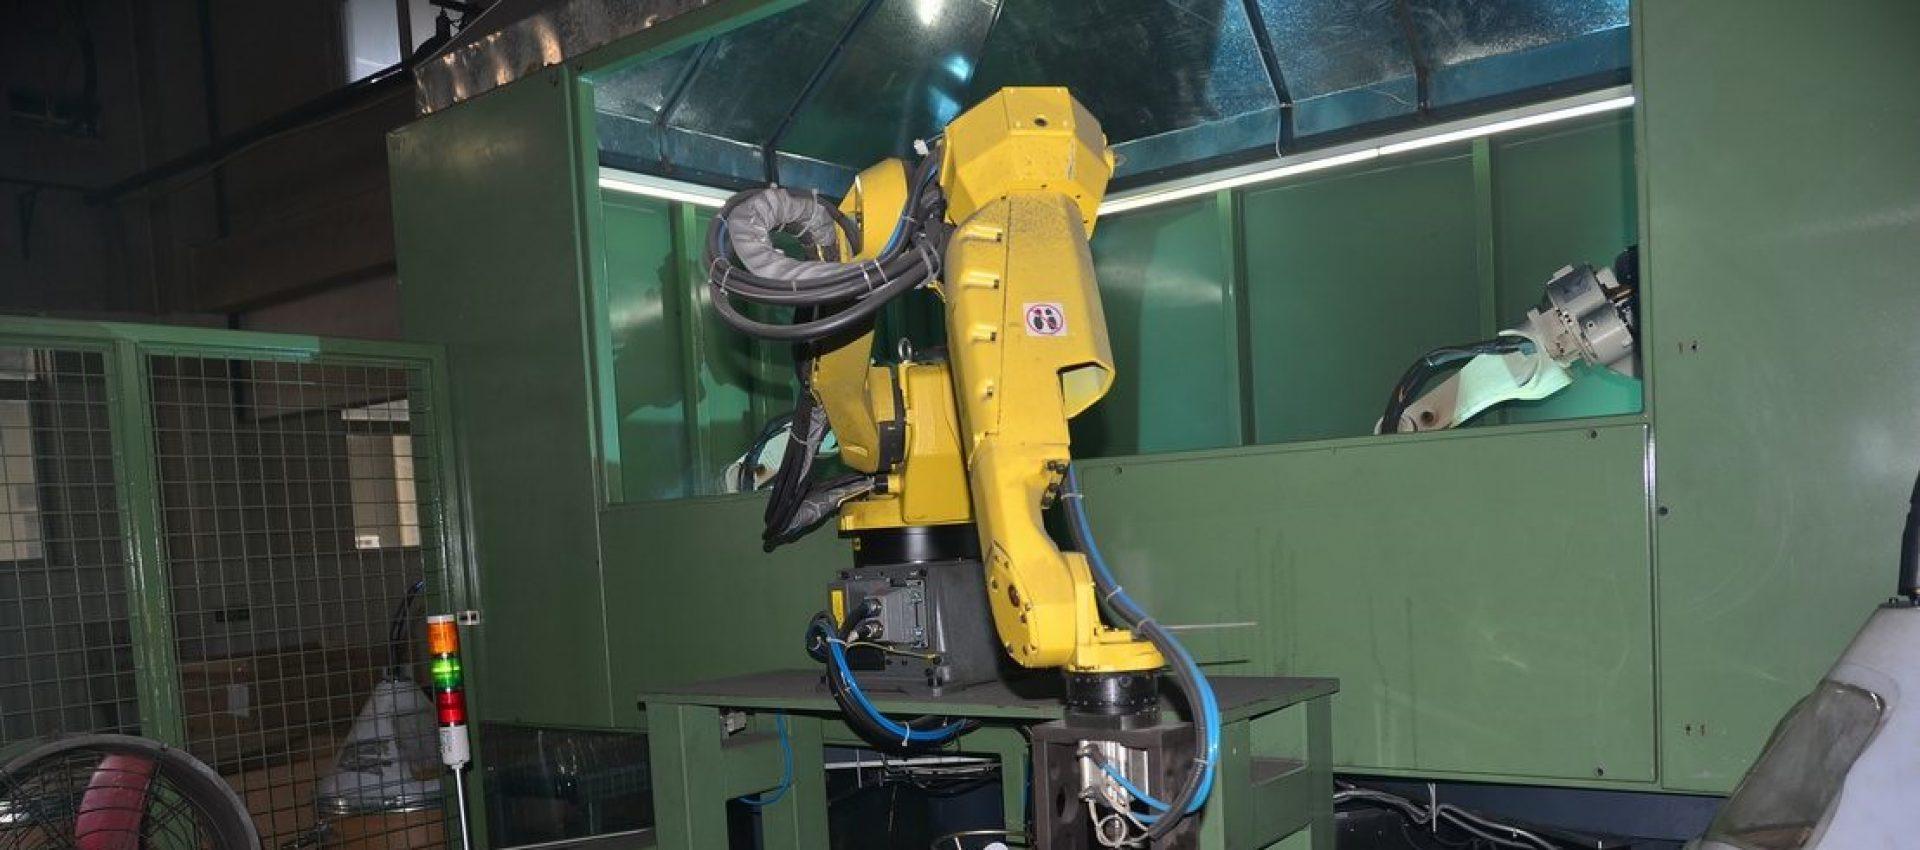 Huayi Compressor